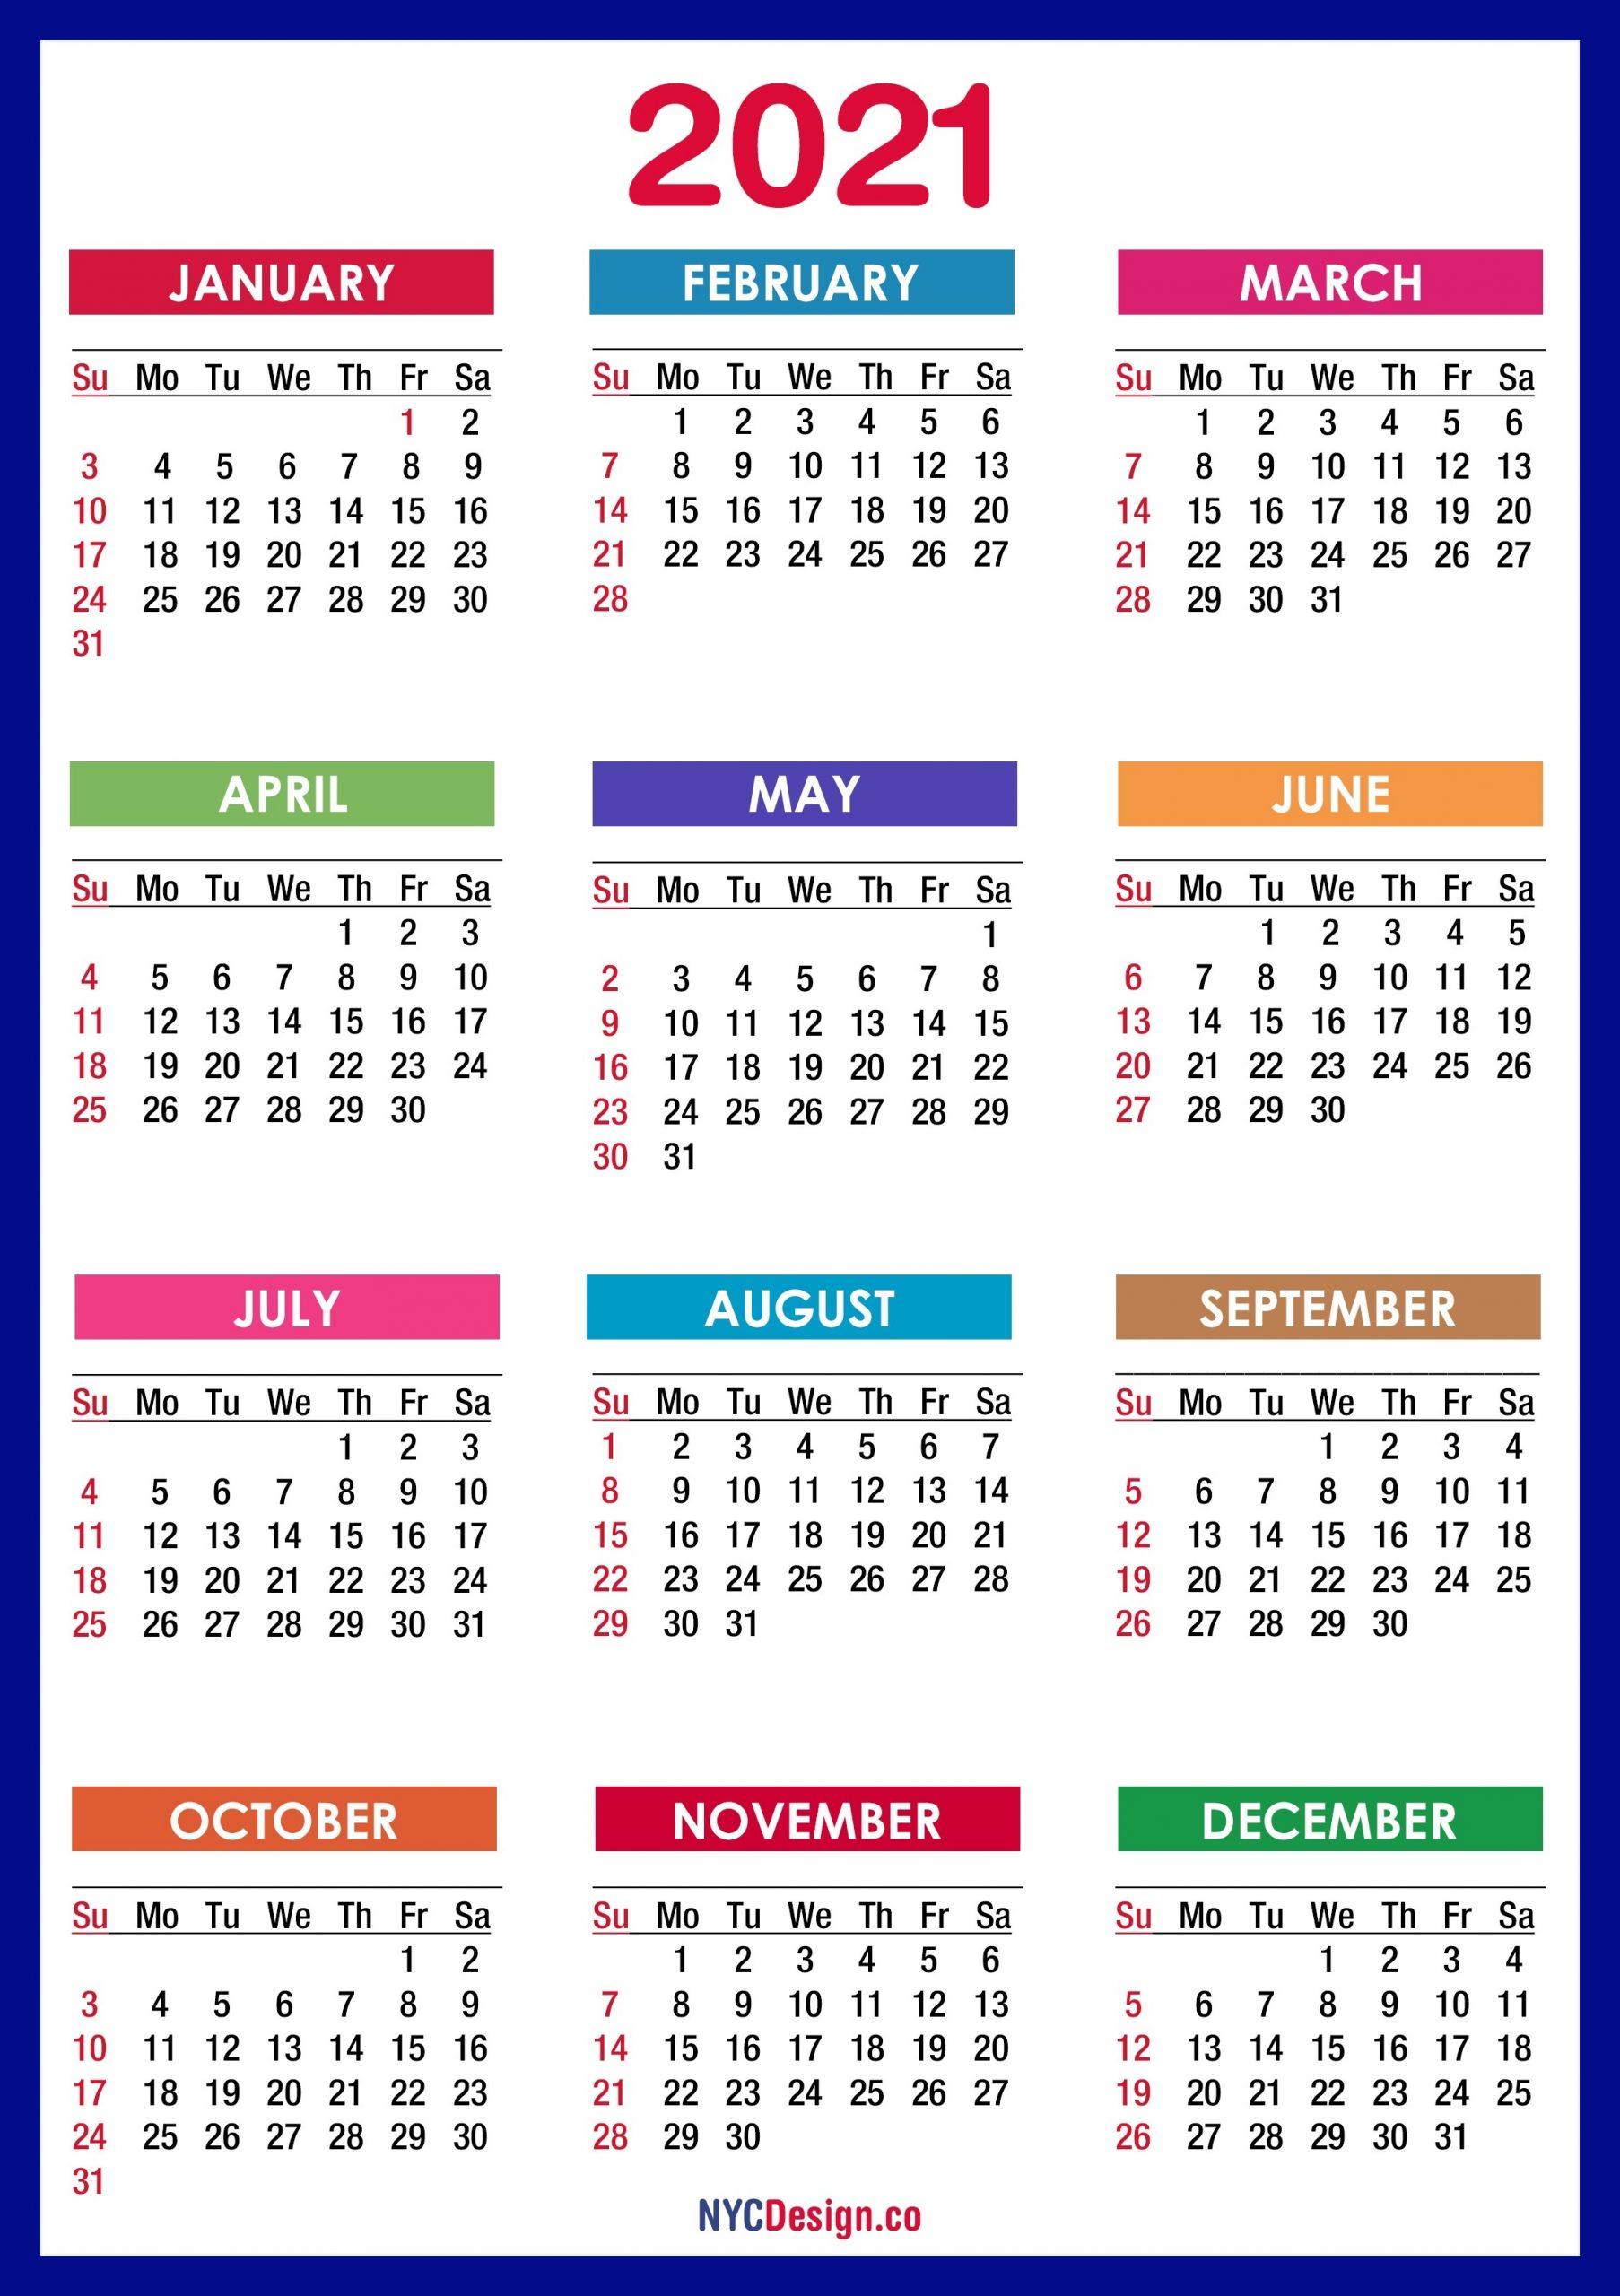 2021 Calendar Printable Free, Pdf, Colorful, Blue, Green  Calandar 2021 Pdf